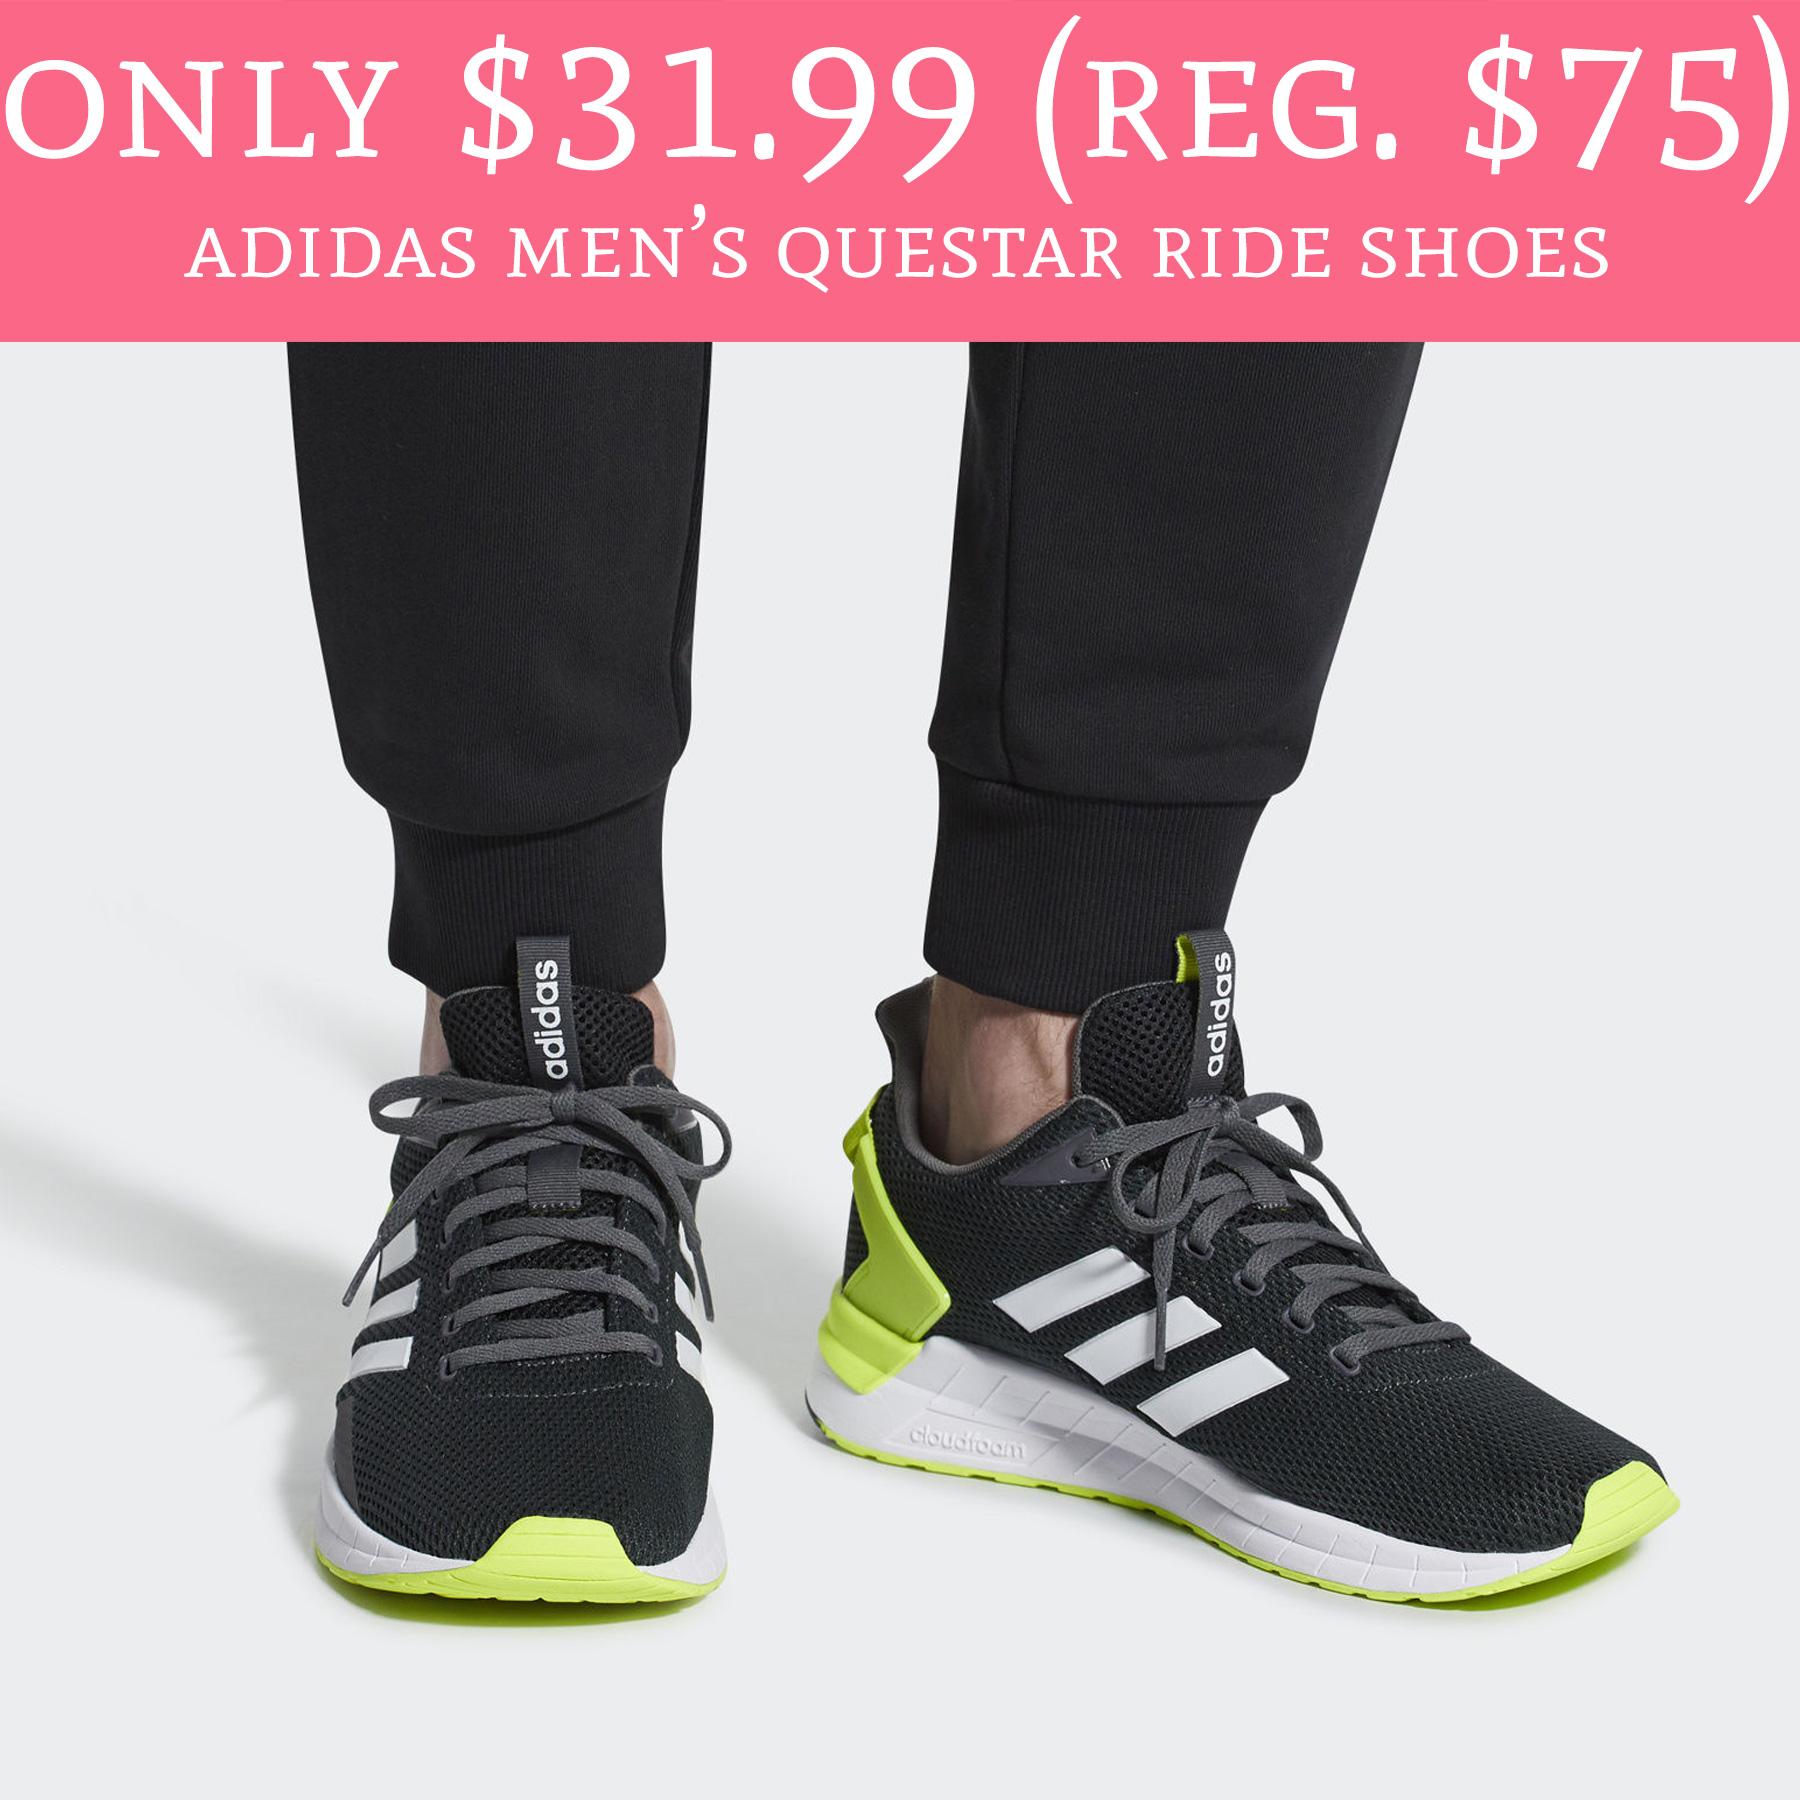 Only $31.99 (Regular $75) Adidas Men's